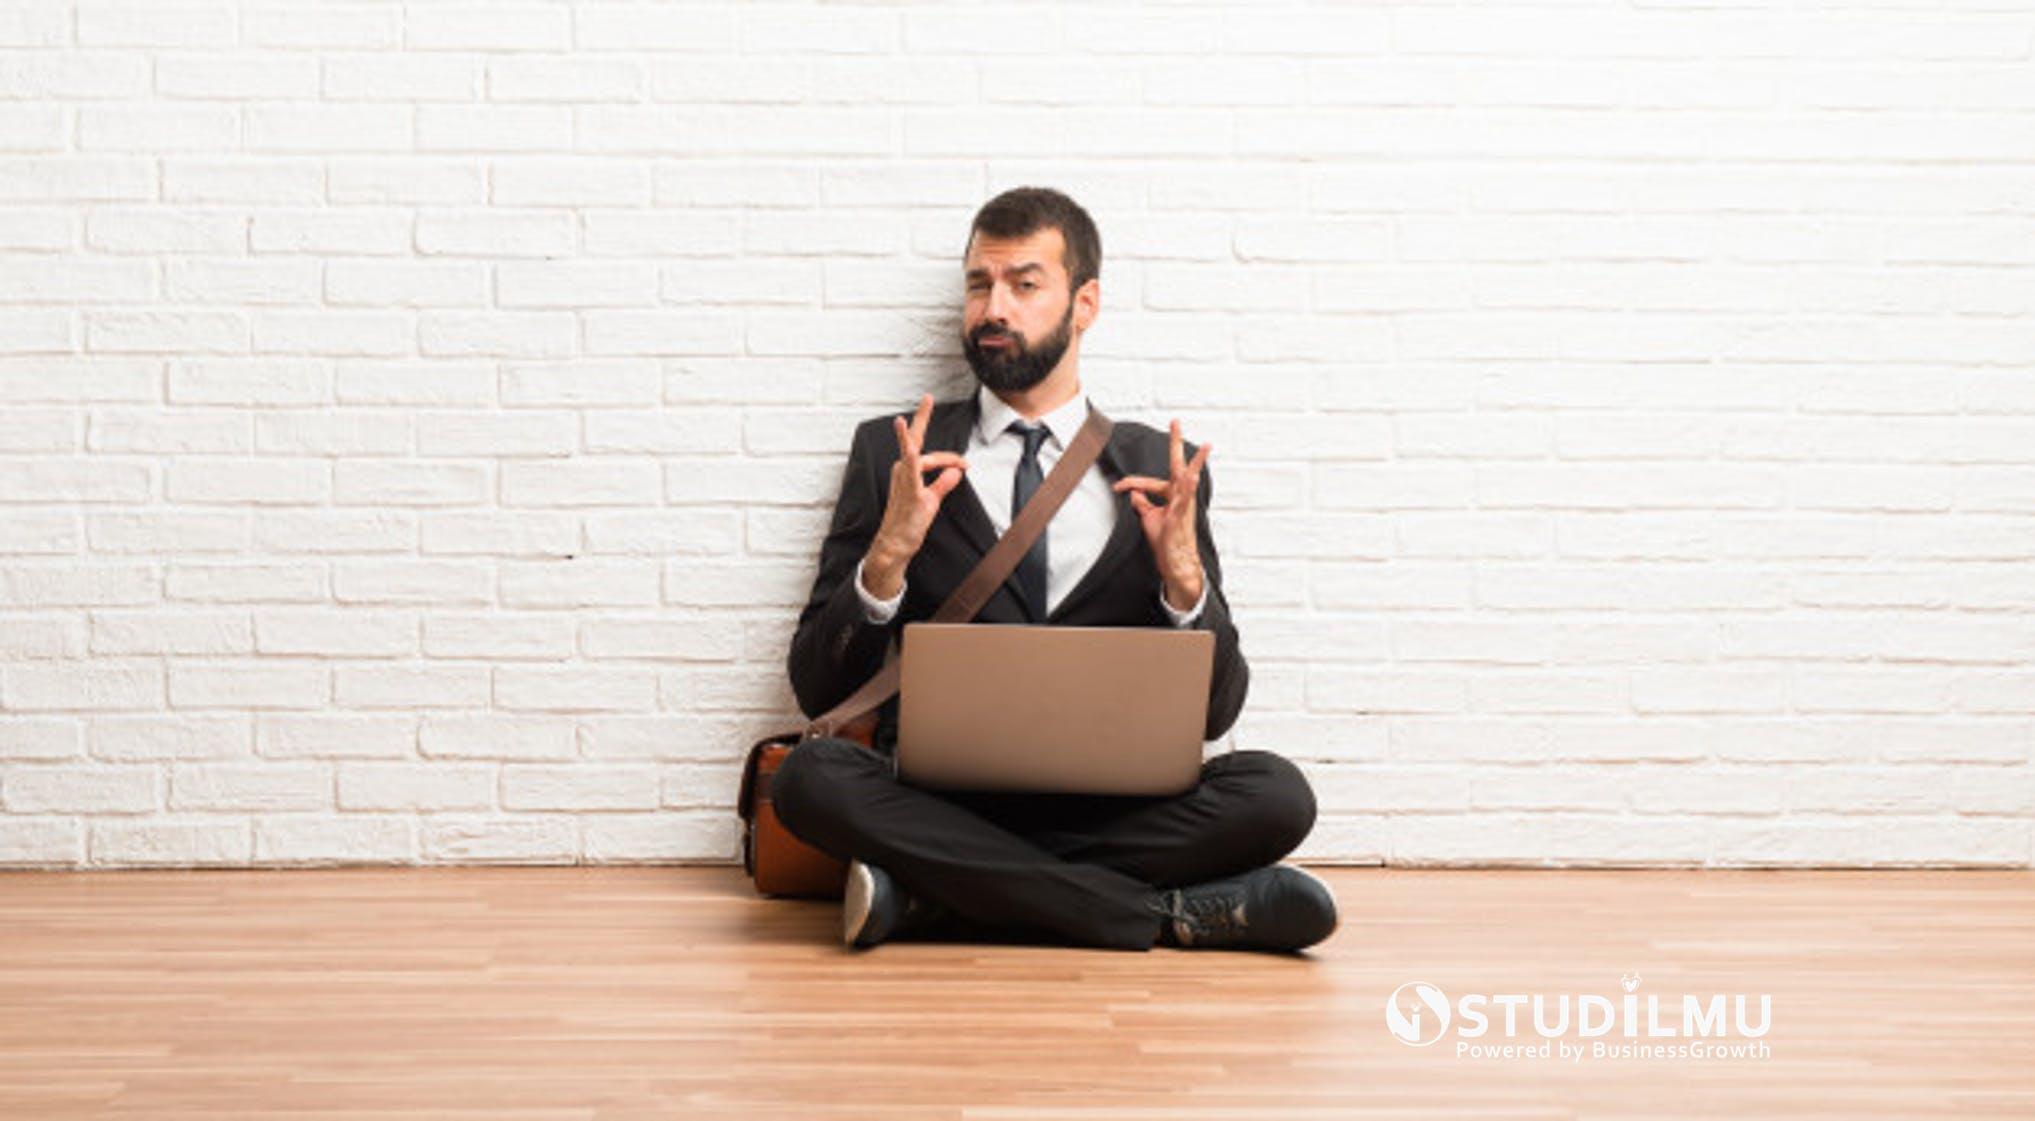 STUDILMU Career Advice - 5 Cara Menghargai Diri Sendiri